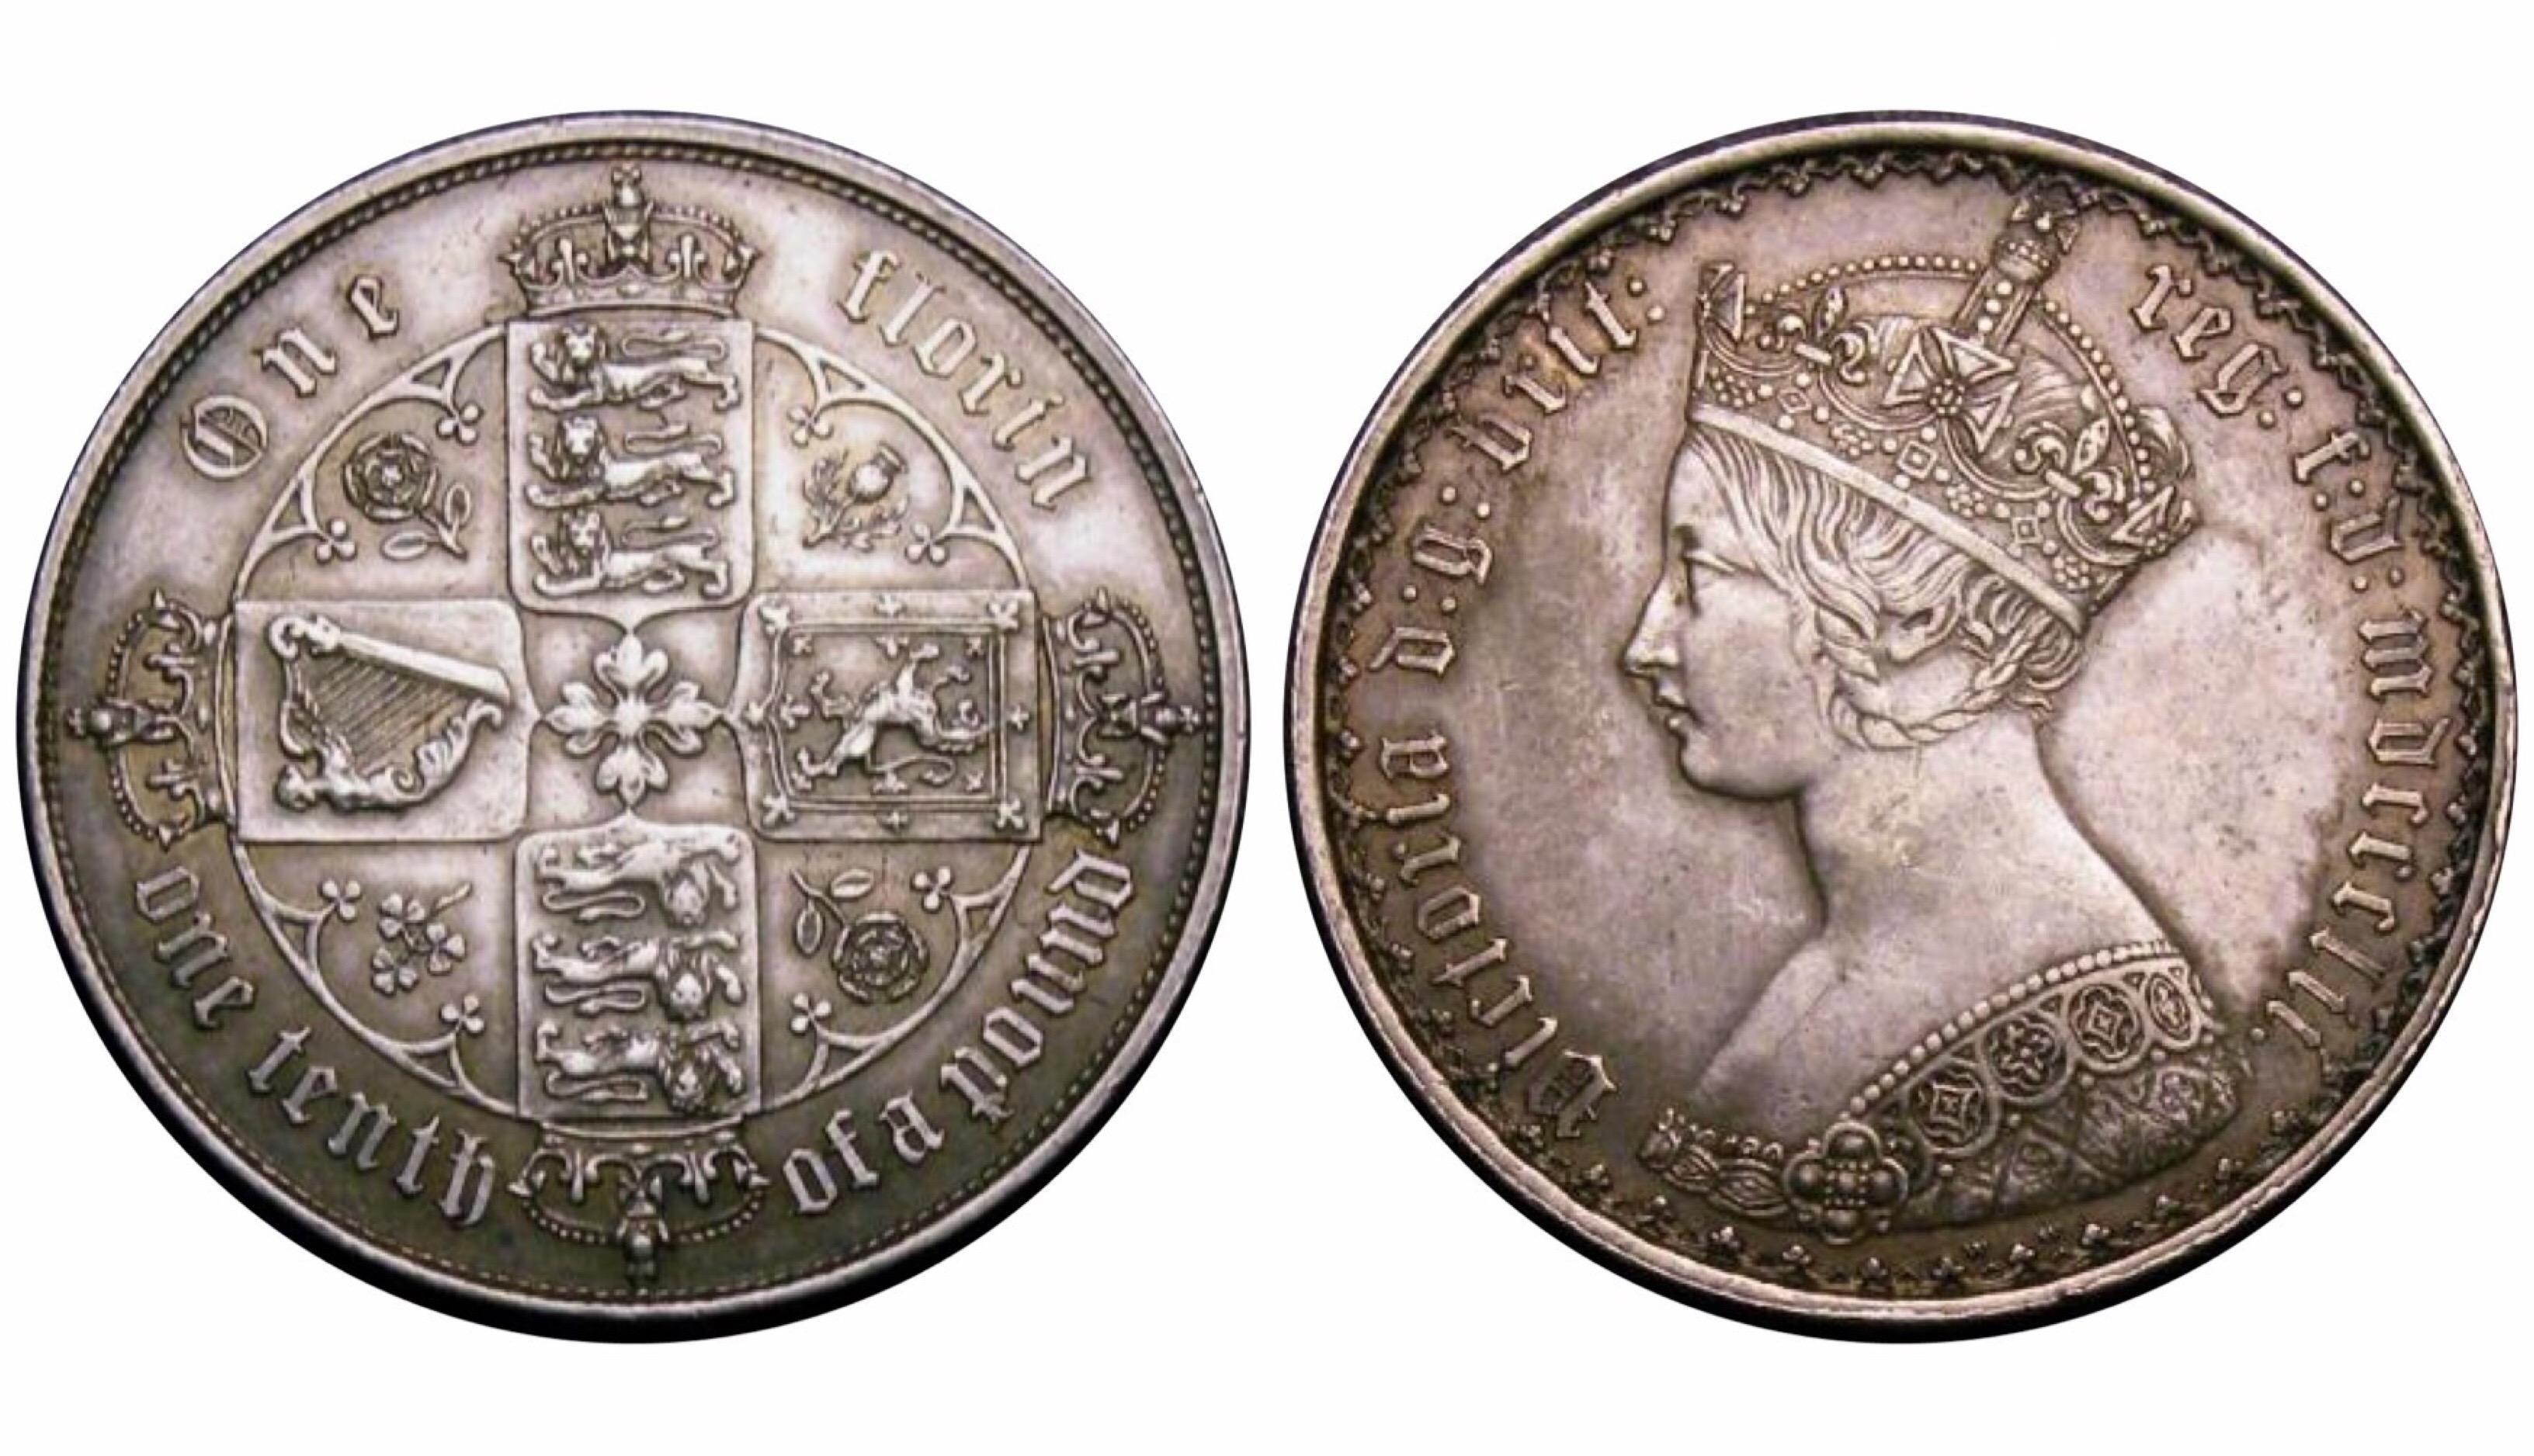 1852 Florin, CGS 60(AU 58-MS 60), EF, Victoria, ESC 806, UIN 25577